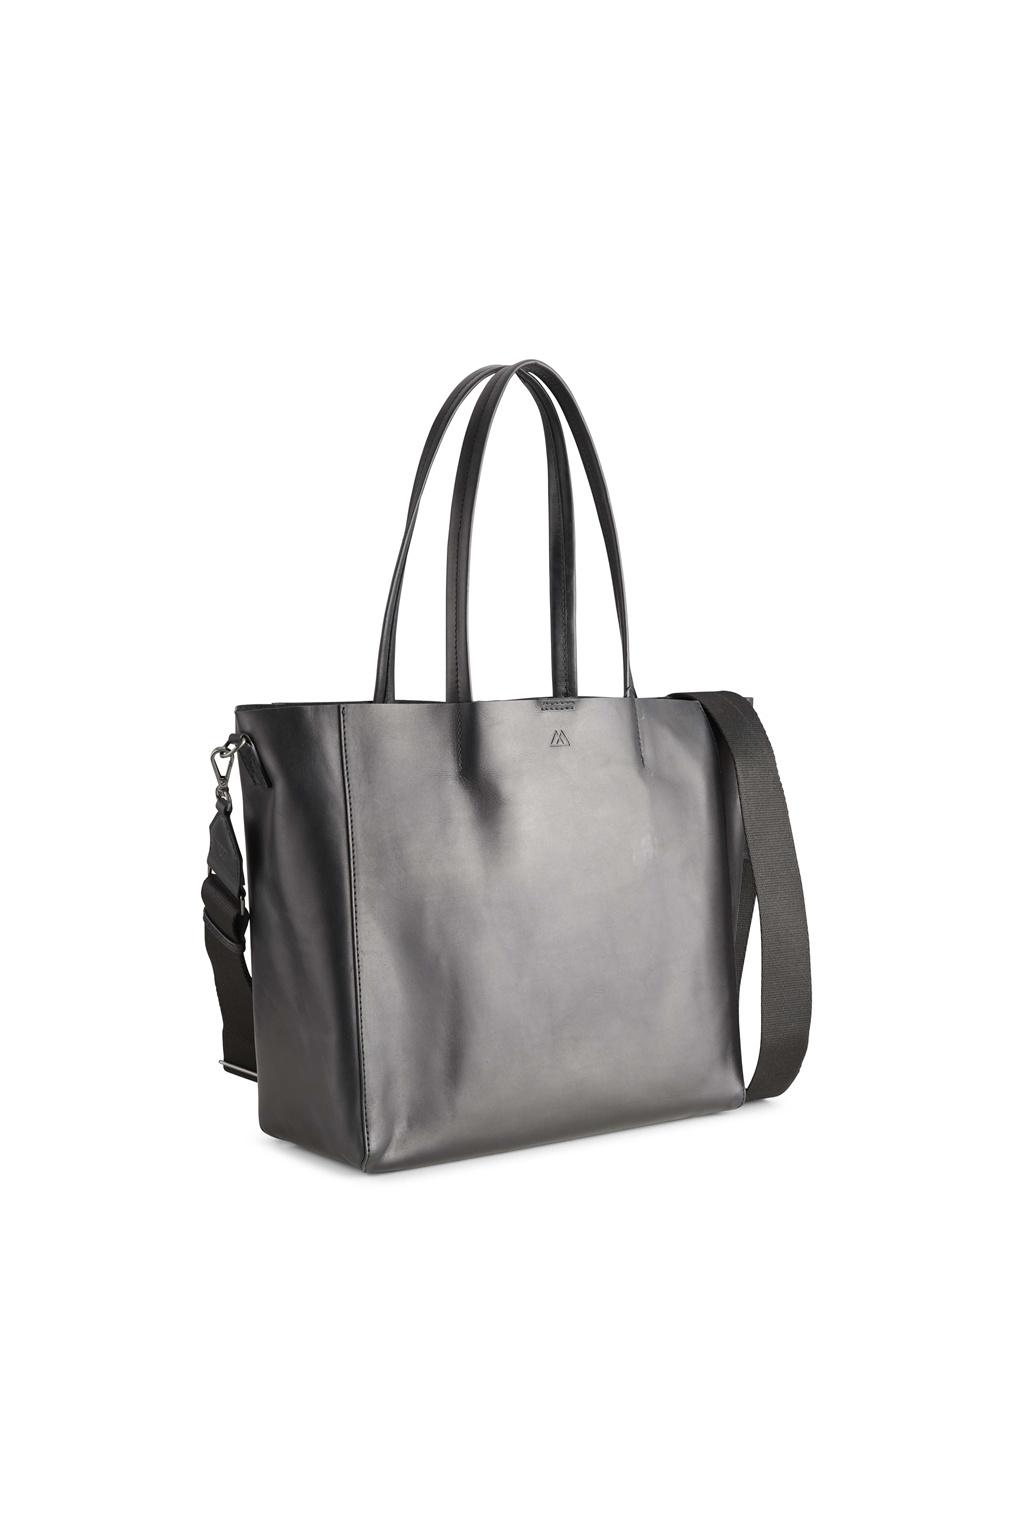 Reese Shopper Bag - Antique Black w/ Black-2